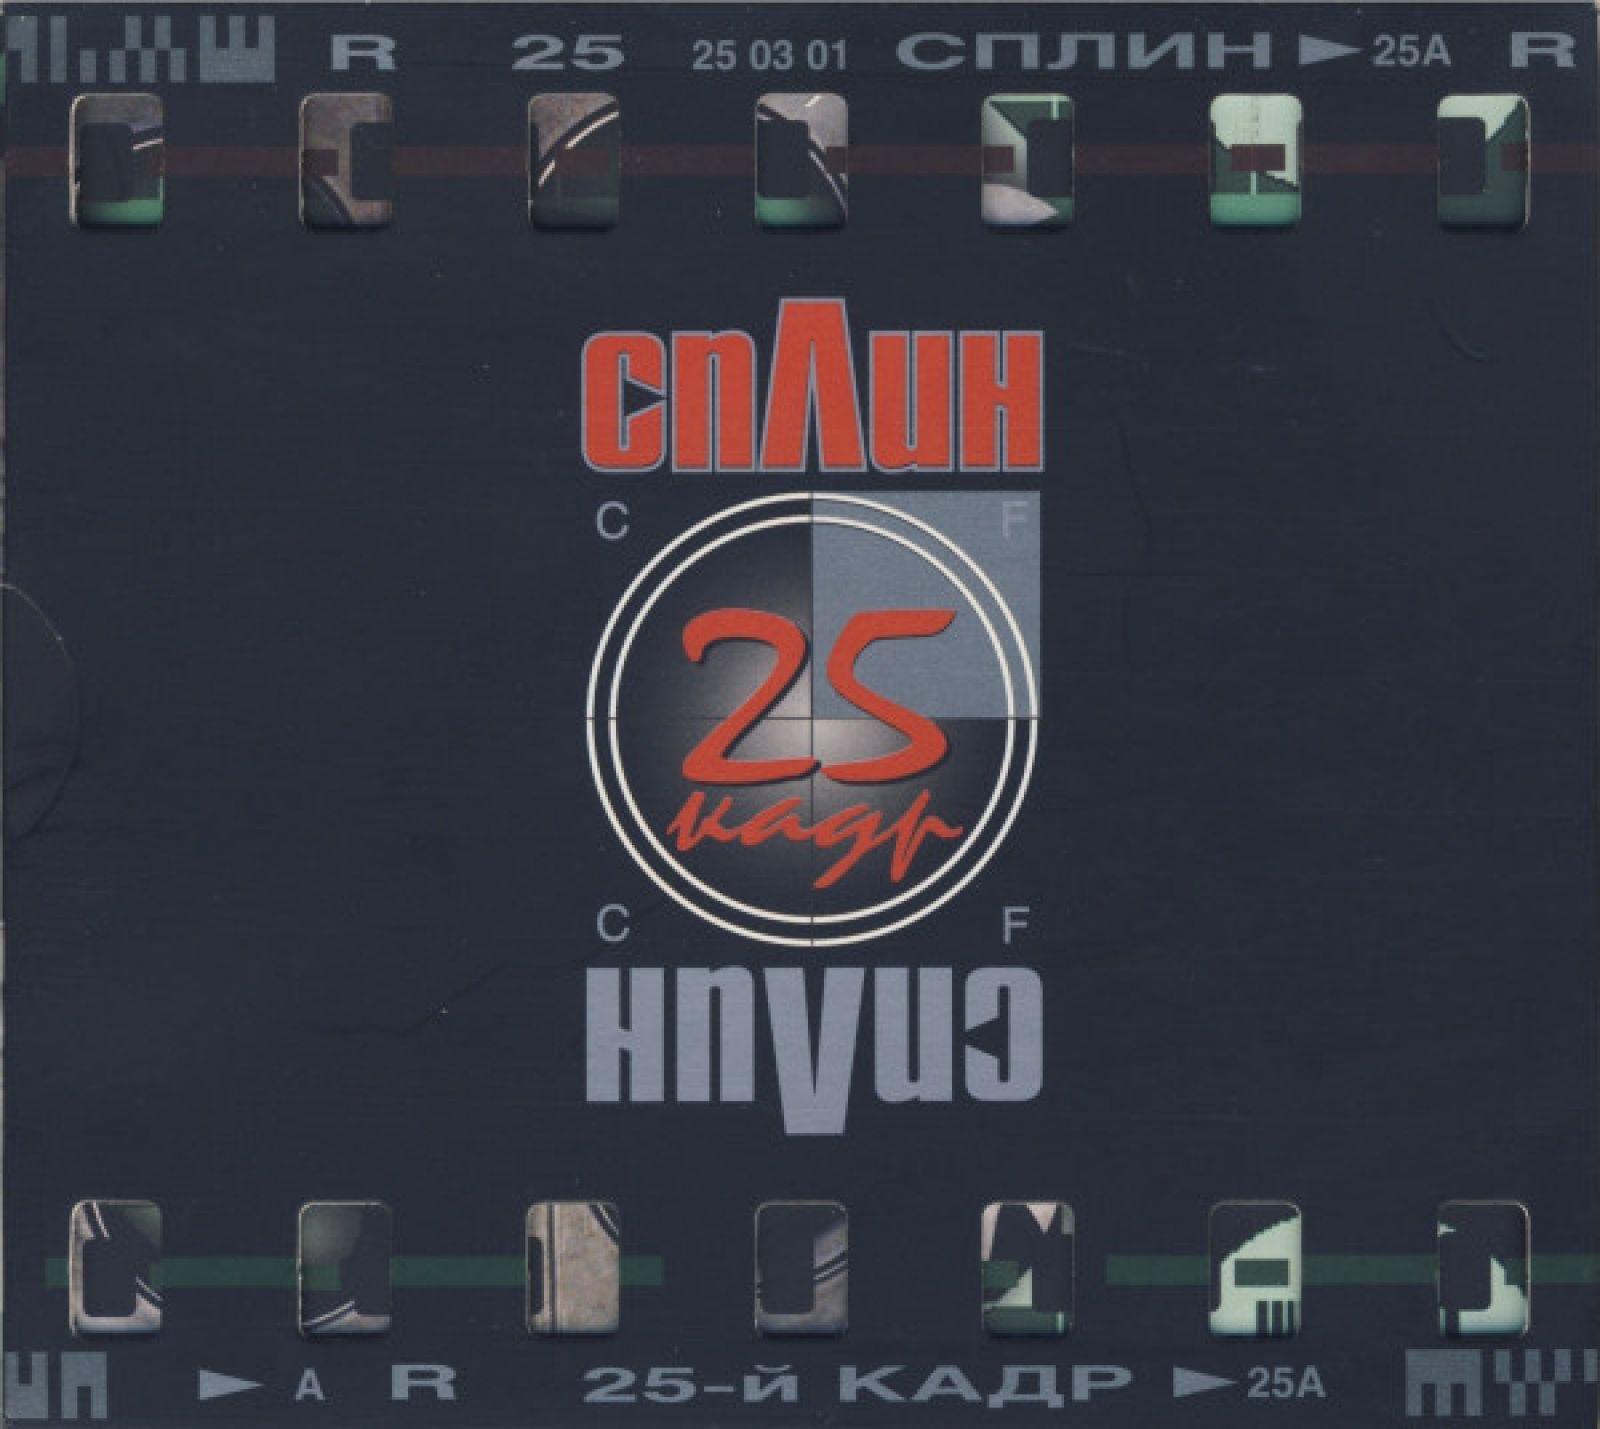 25 кадр сплин